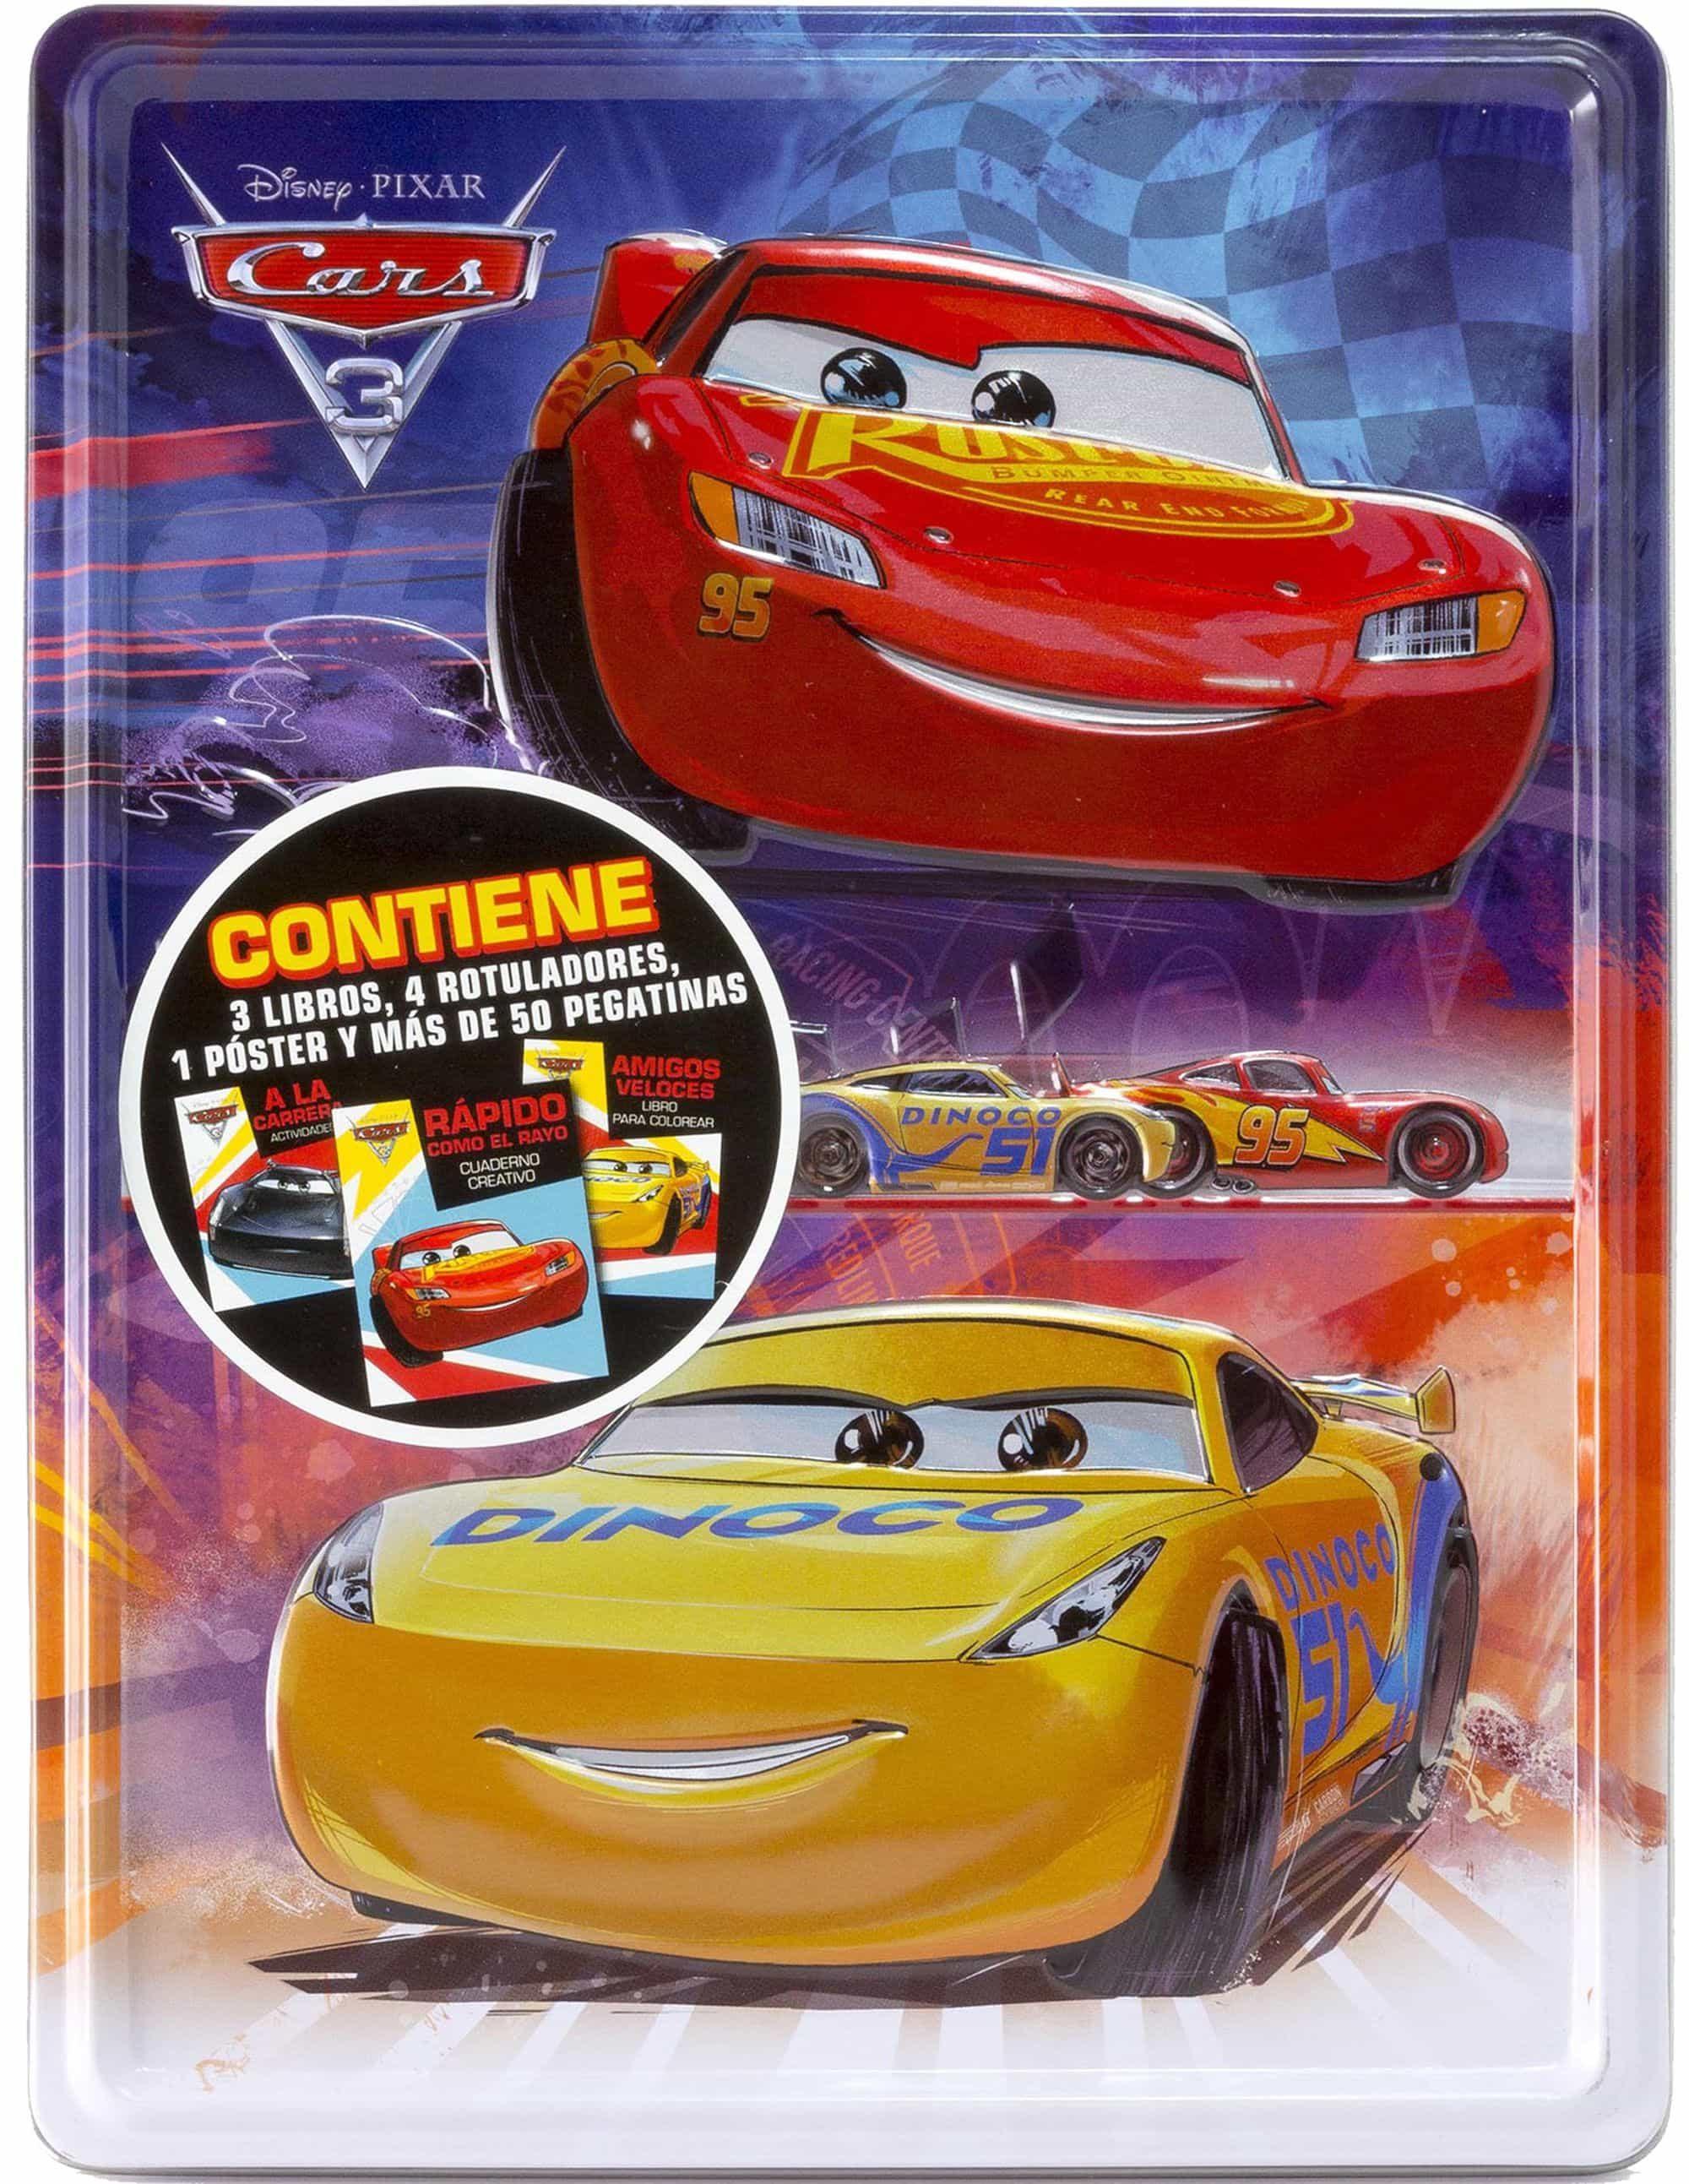 Cars 3: Caja Metalica por Vv.aa.